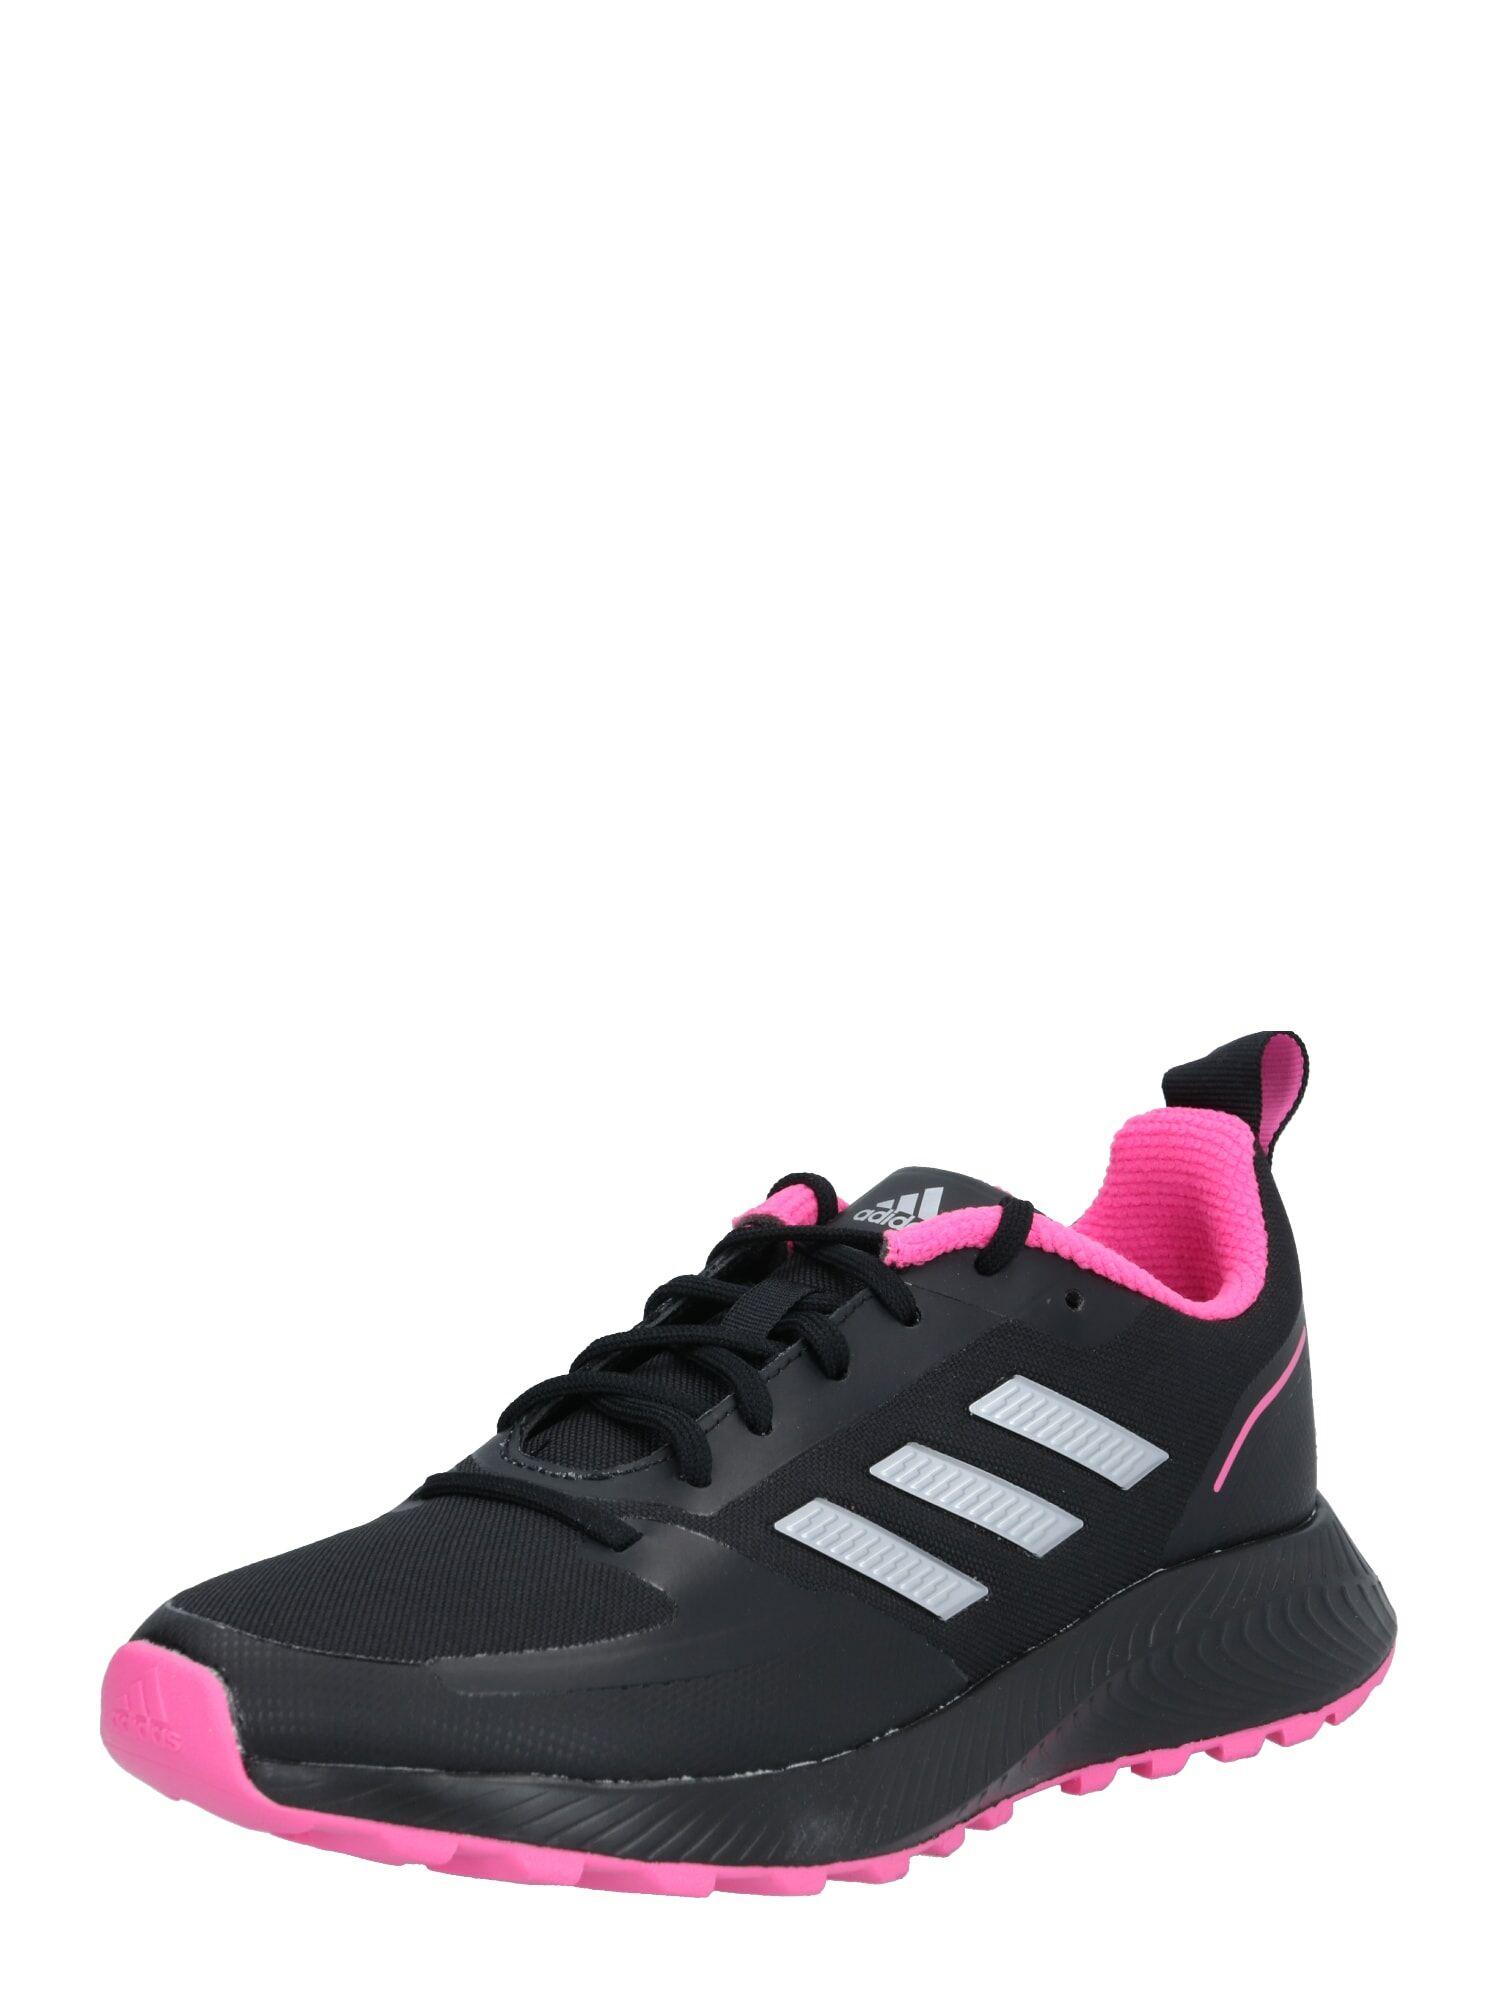 ADIDAS PERFORMANCE Chaussure de course 'Runfalcon 2.0'  - Noir - Taille: 6 - female